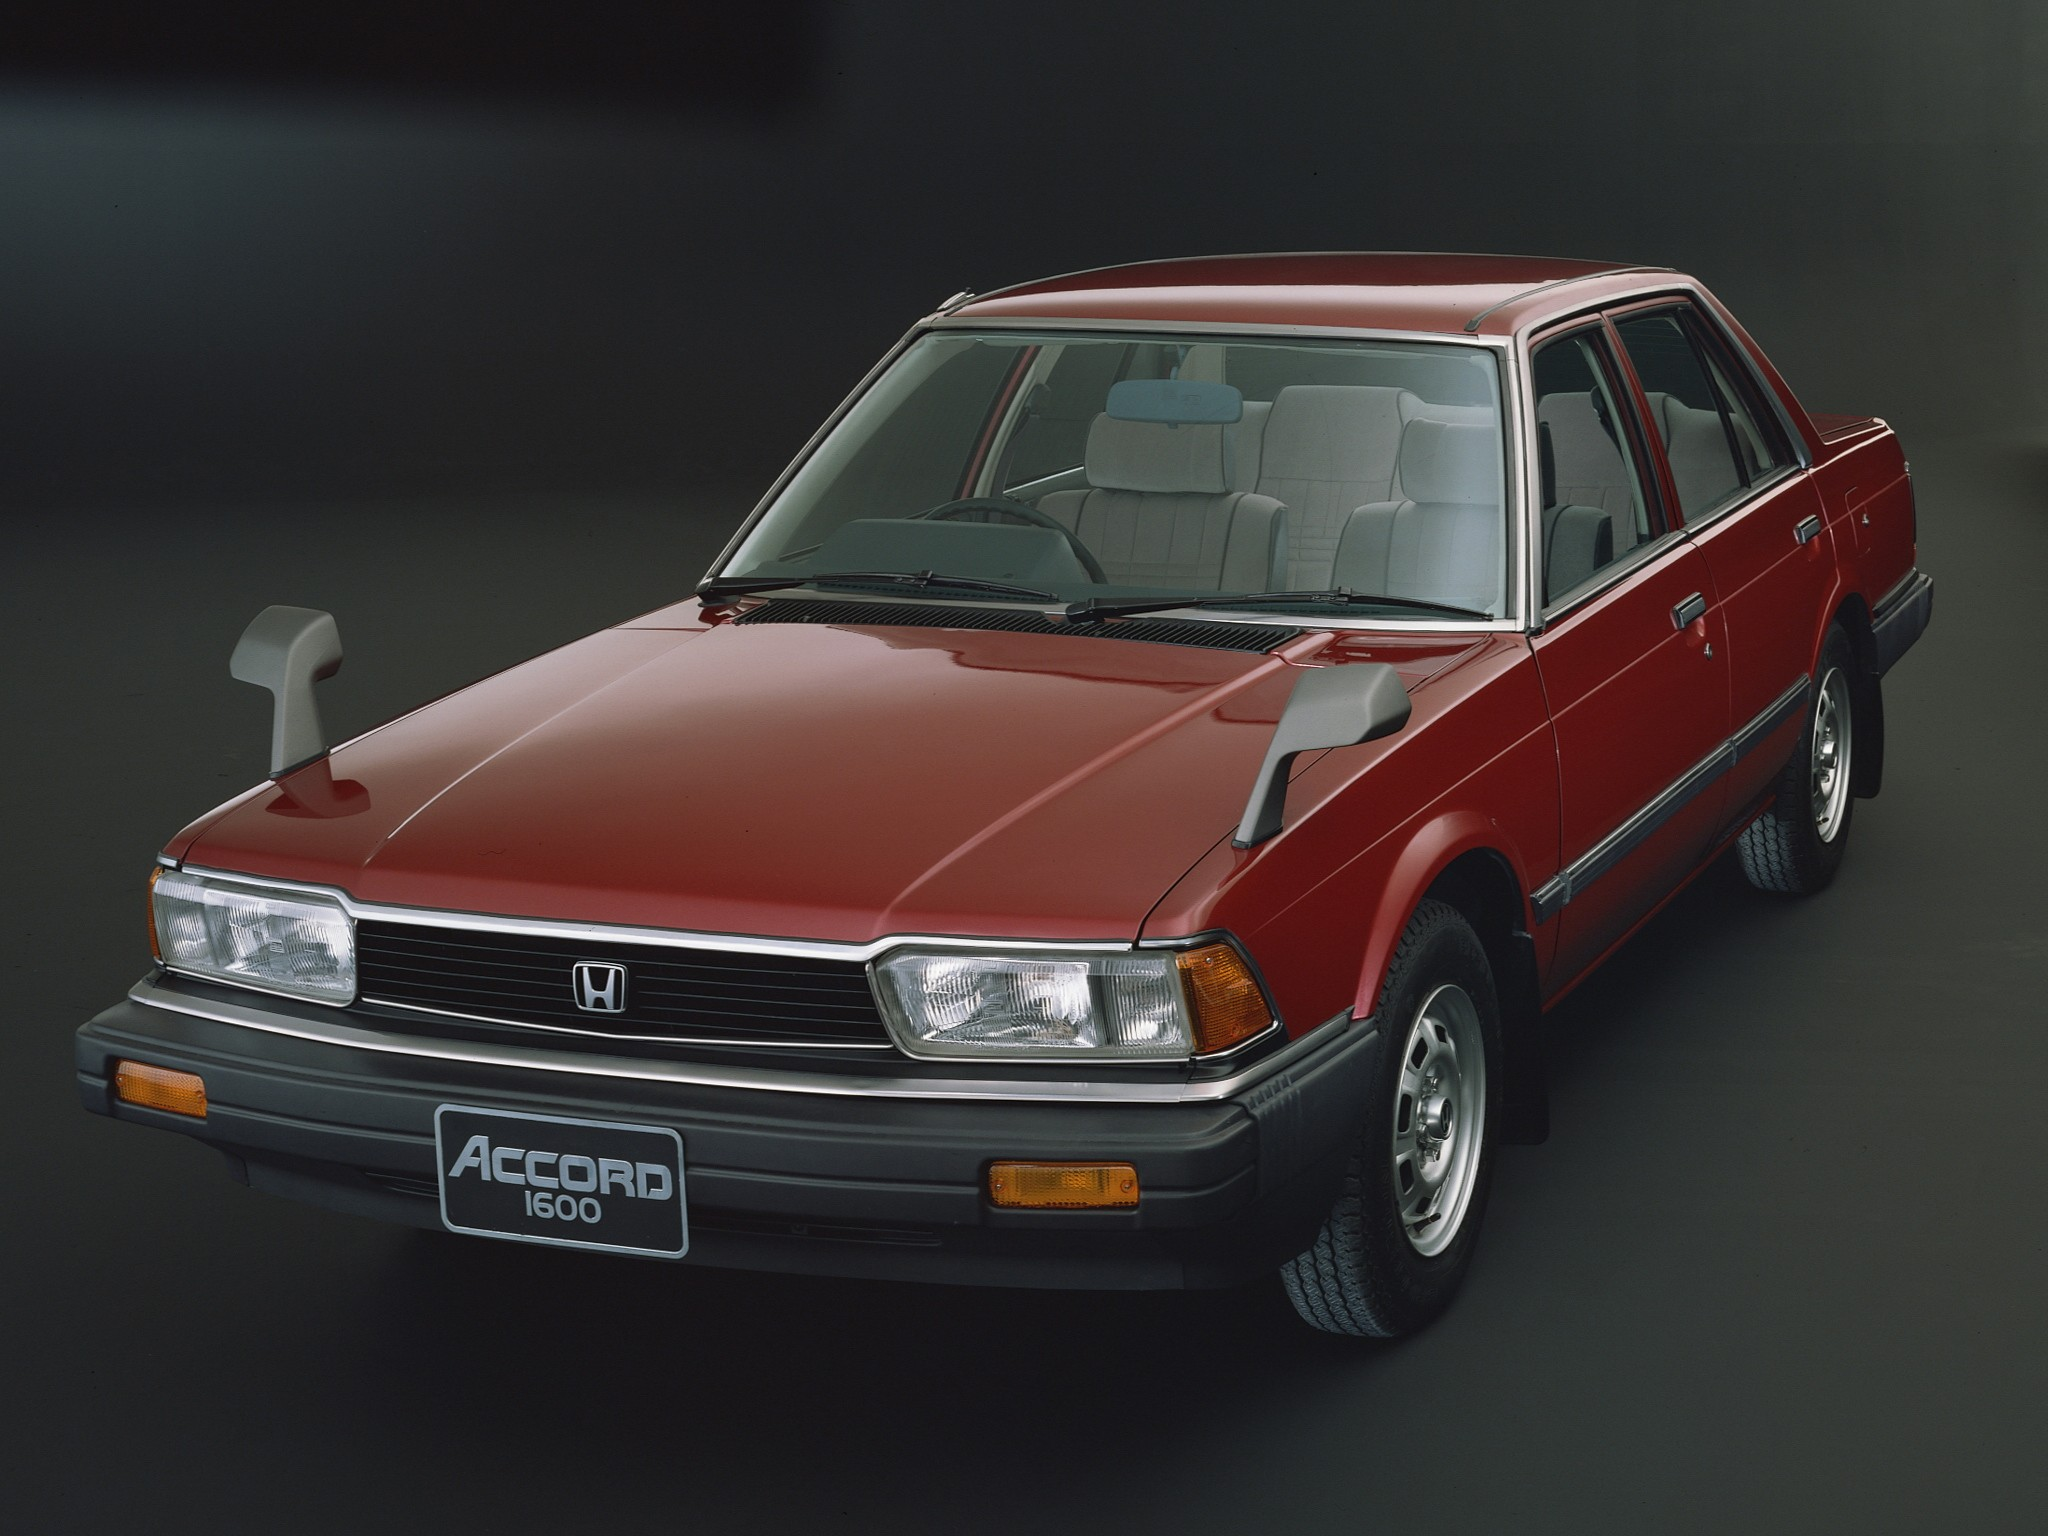 1985 Honda Accord >> HONDA Accord 4 Doors - 1981, 1982, 1983, 1984, 1985 - autoevolution